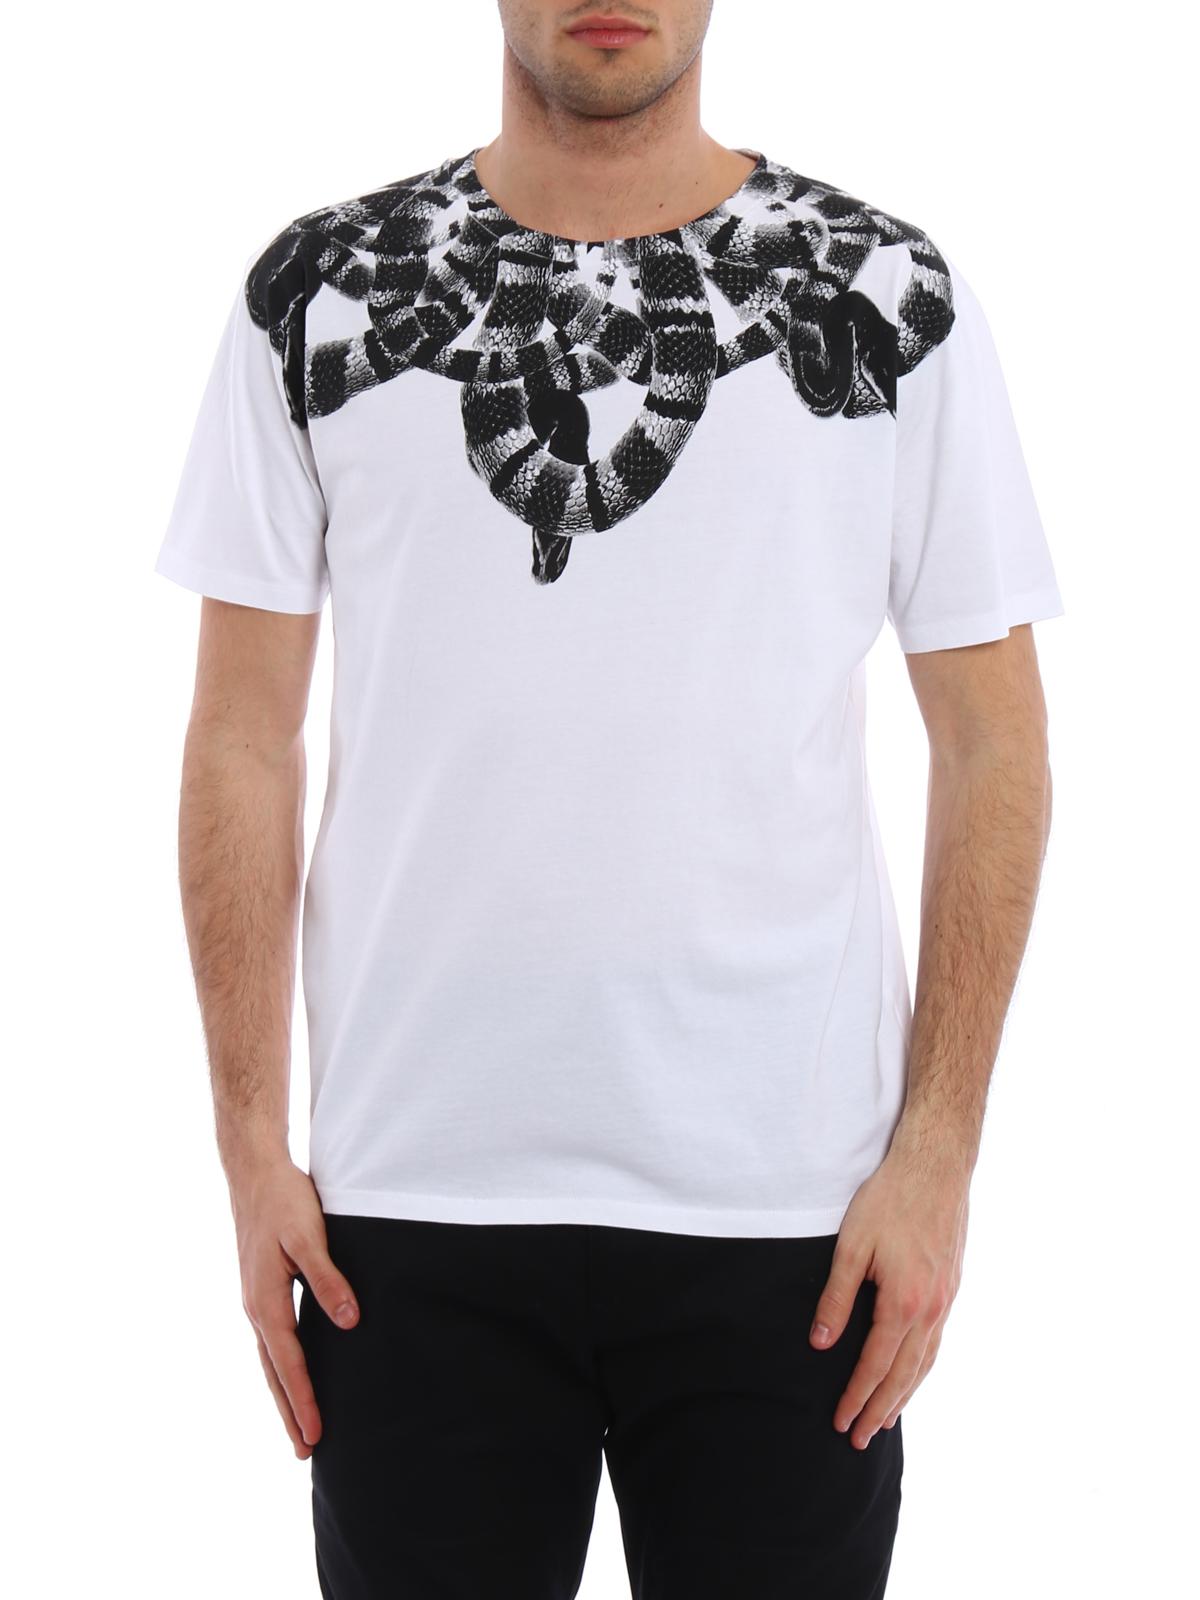 on sale 5c227 ae099 Marcelo Burlon - Leonardo T-shirt - t-shirts ...